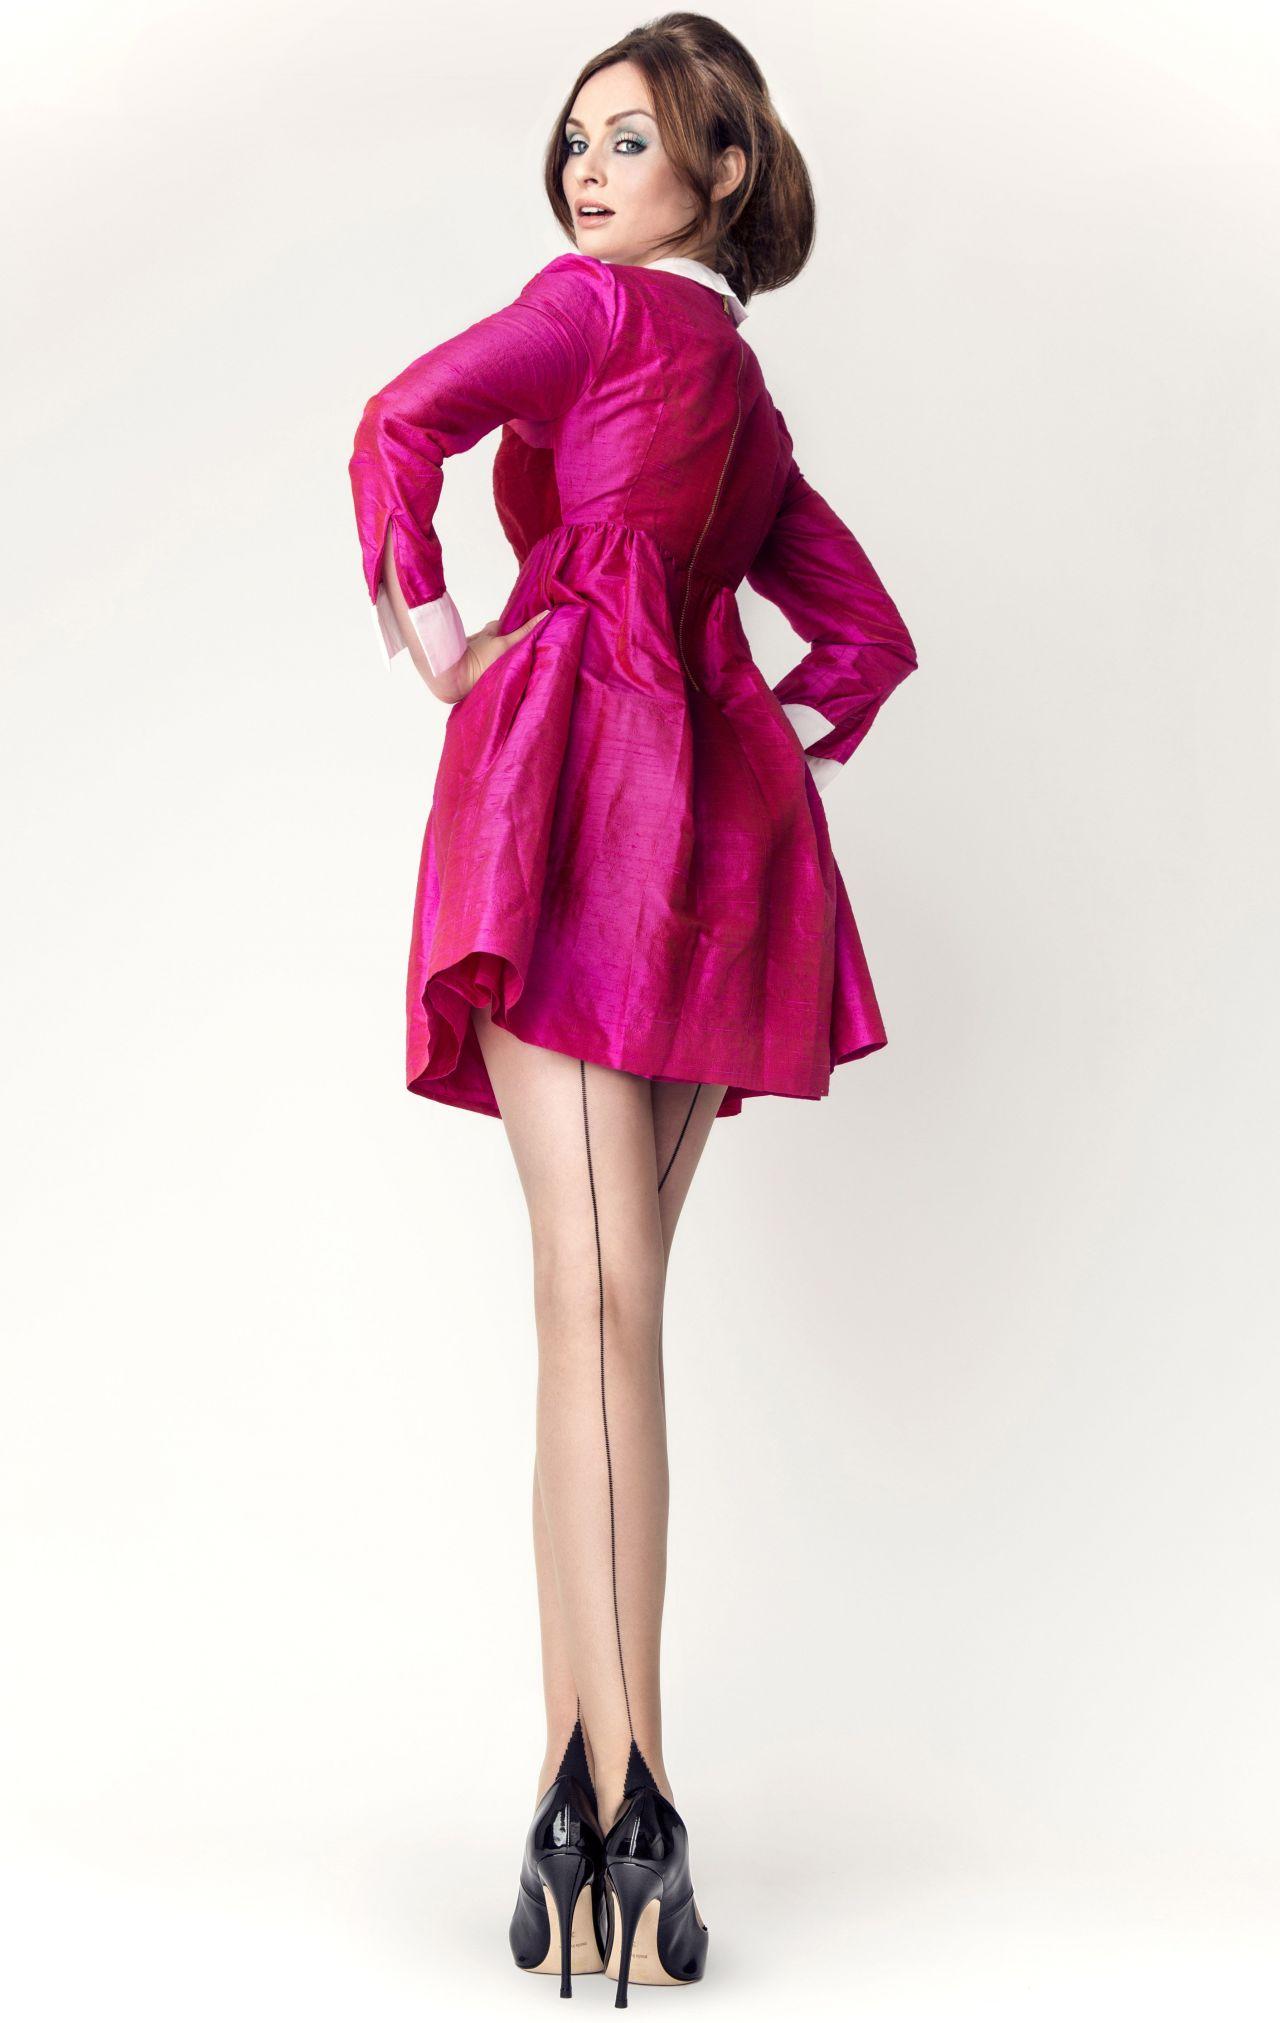 Sophie Ellis Bextor Pretty Polly Tights Promos-1